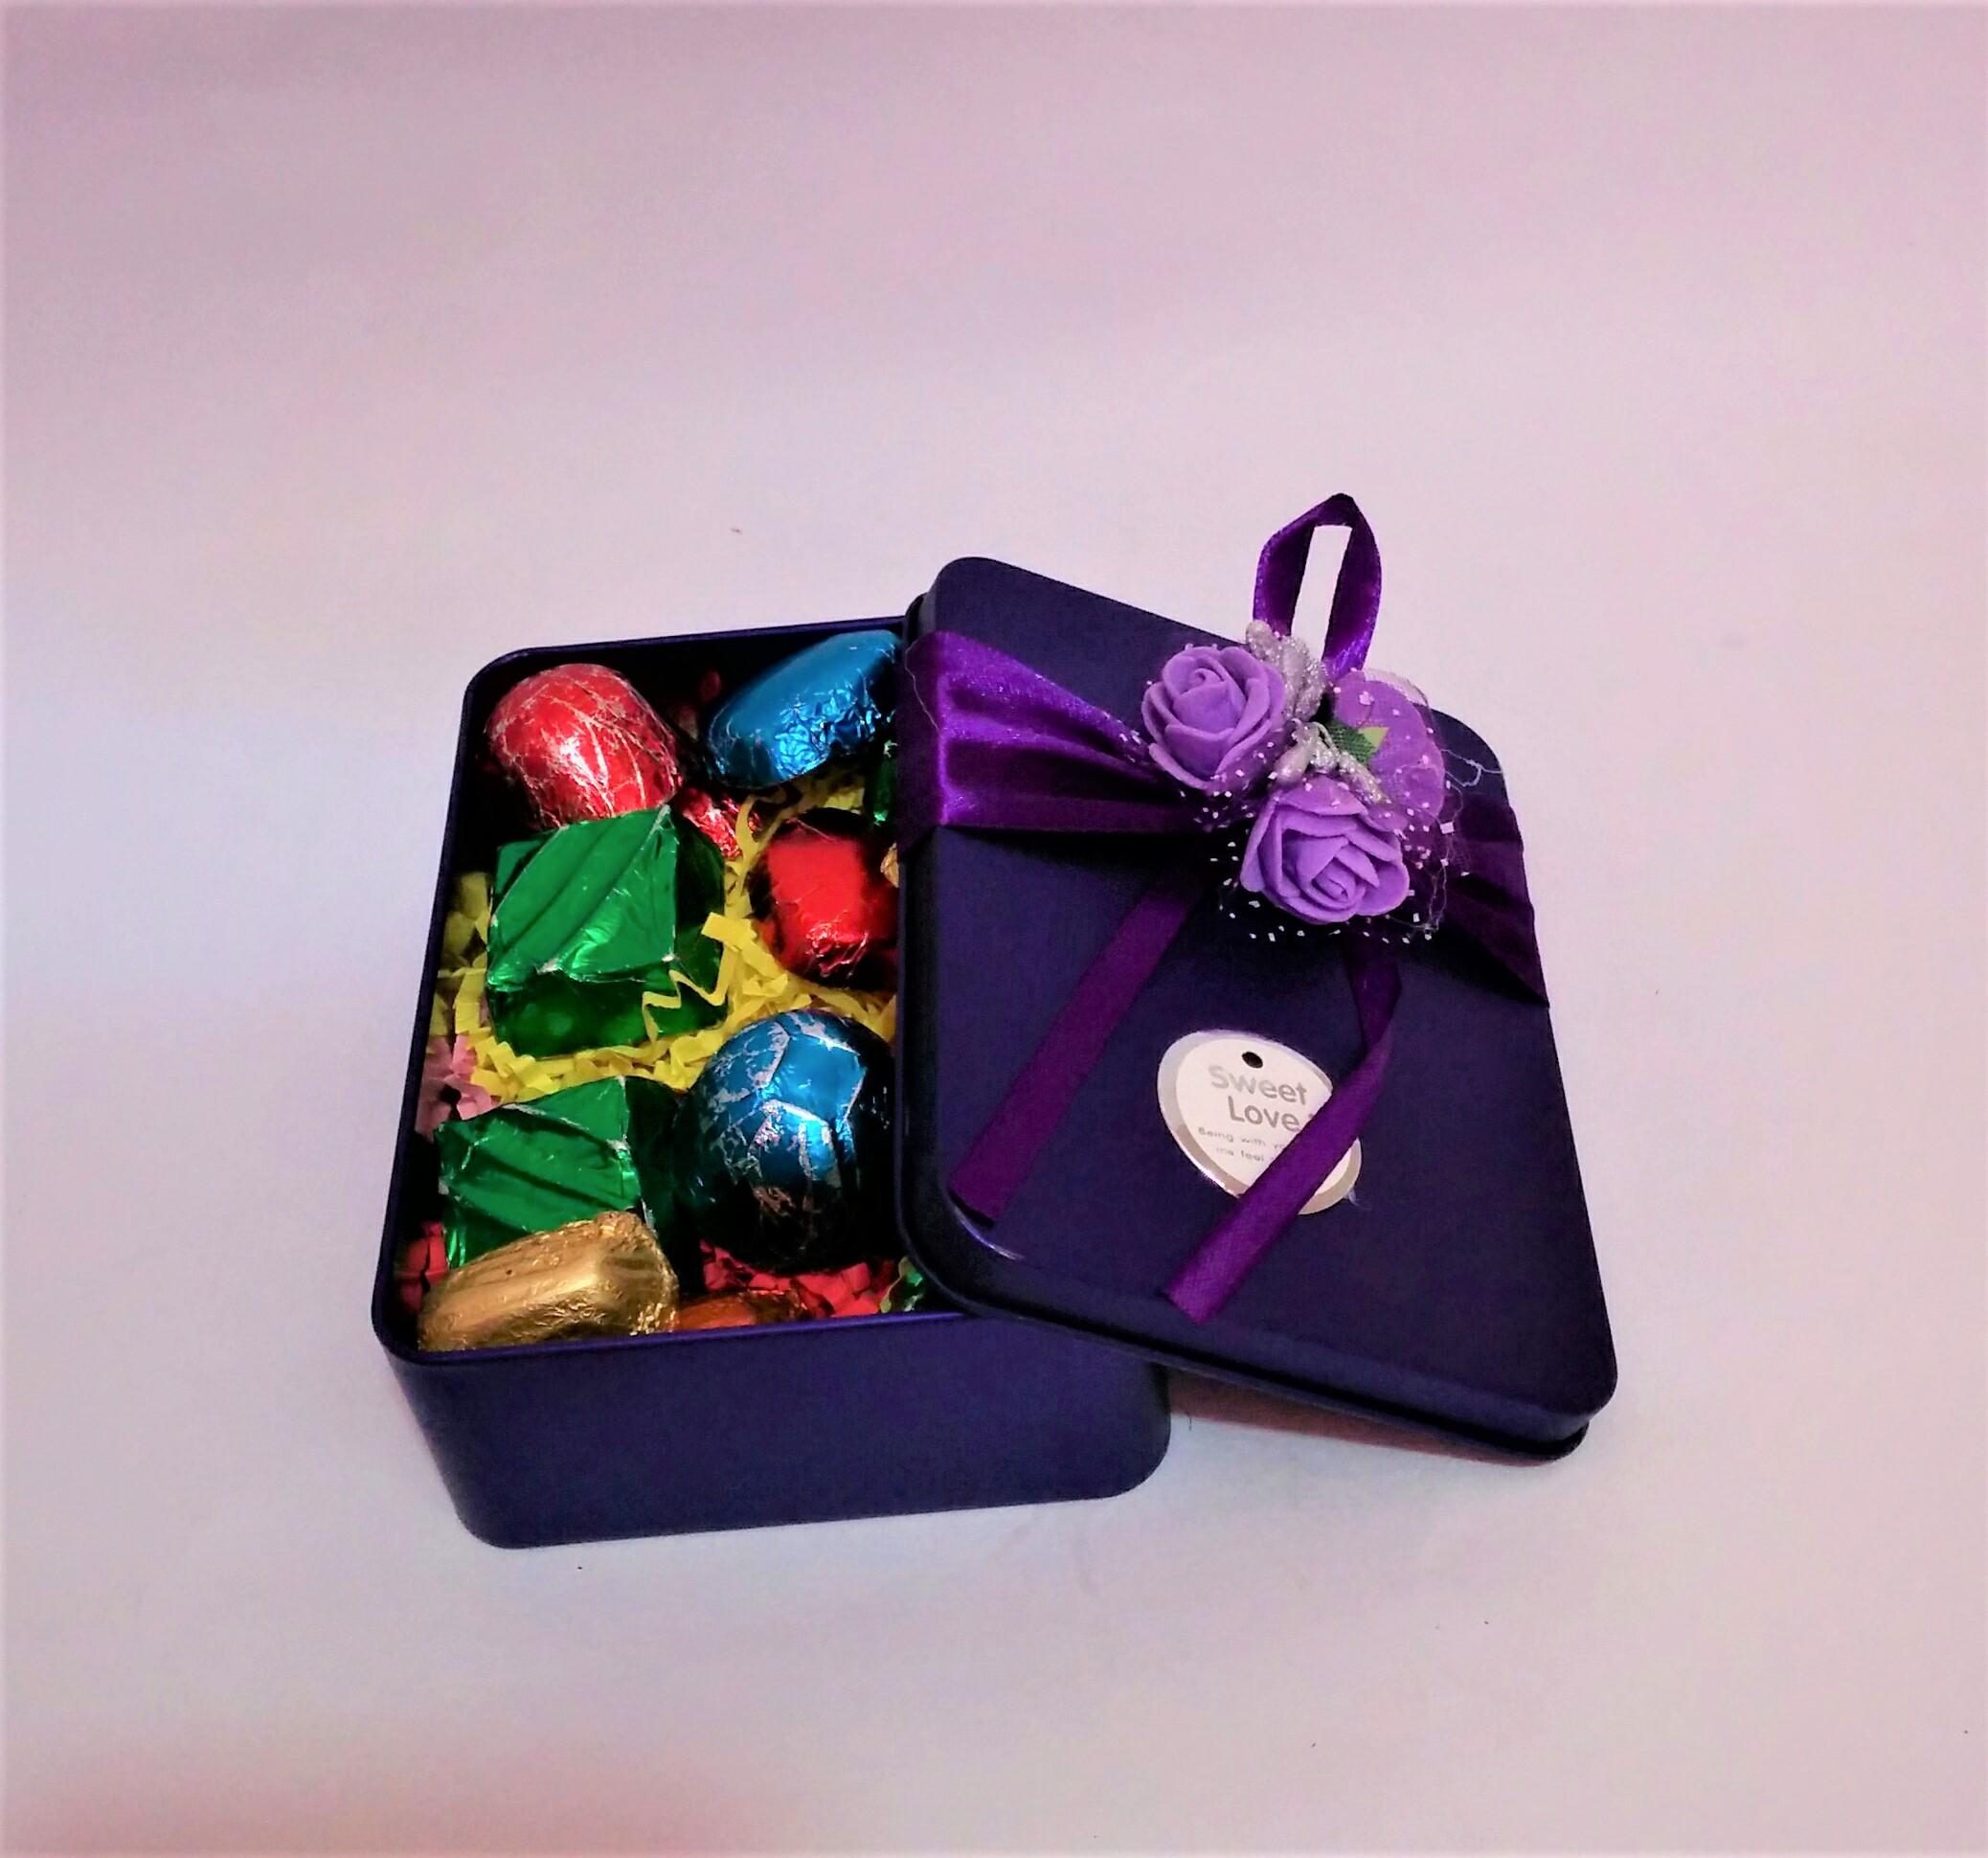 Gift Box of 12 Assorted Chocolates - Rectangular